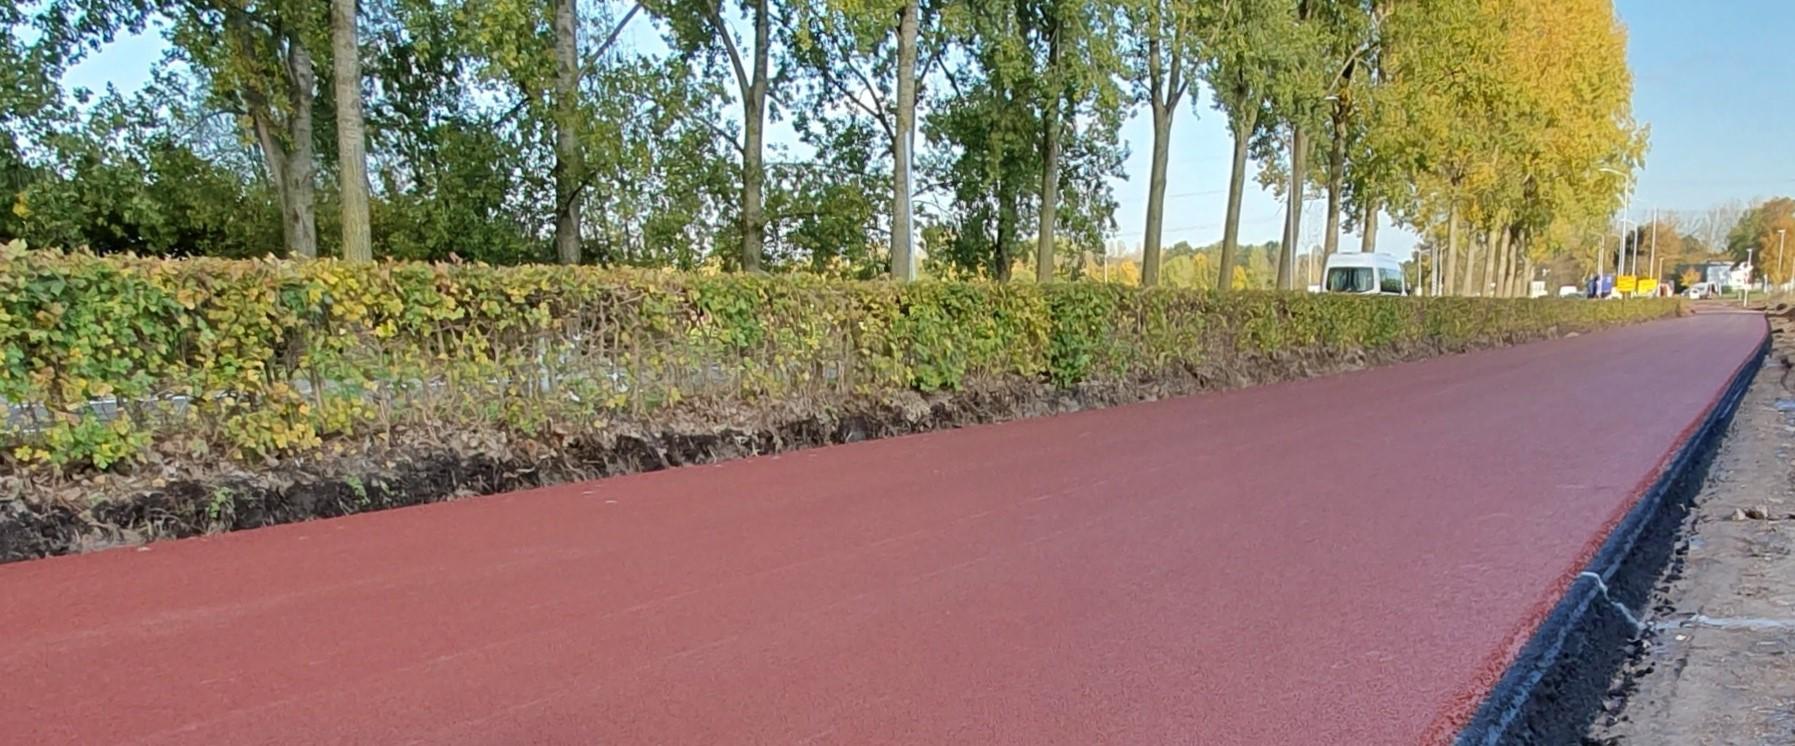 Rood asfalt in Best